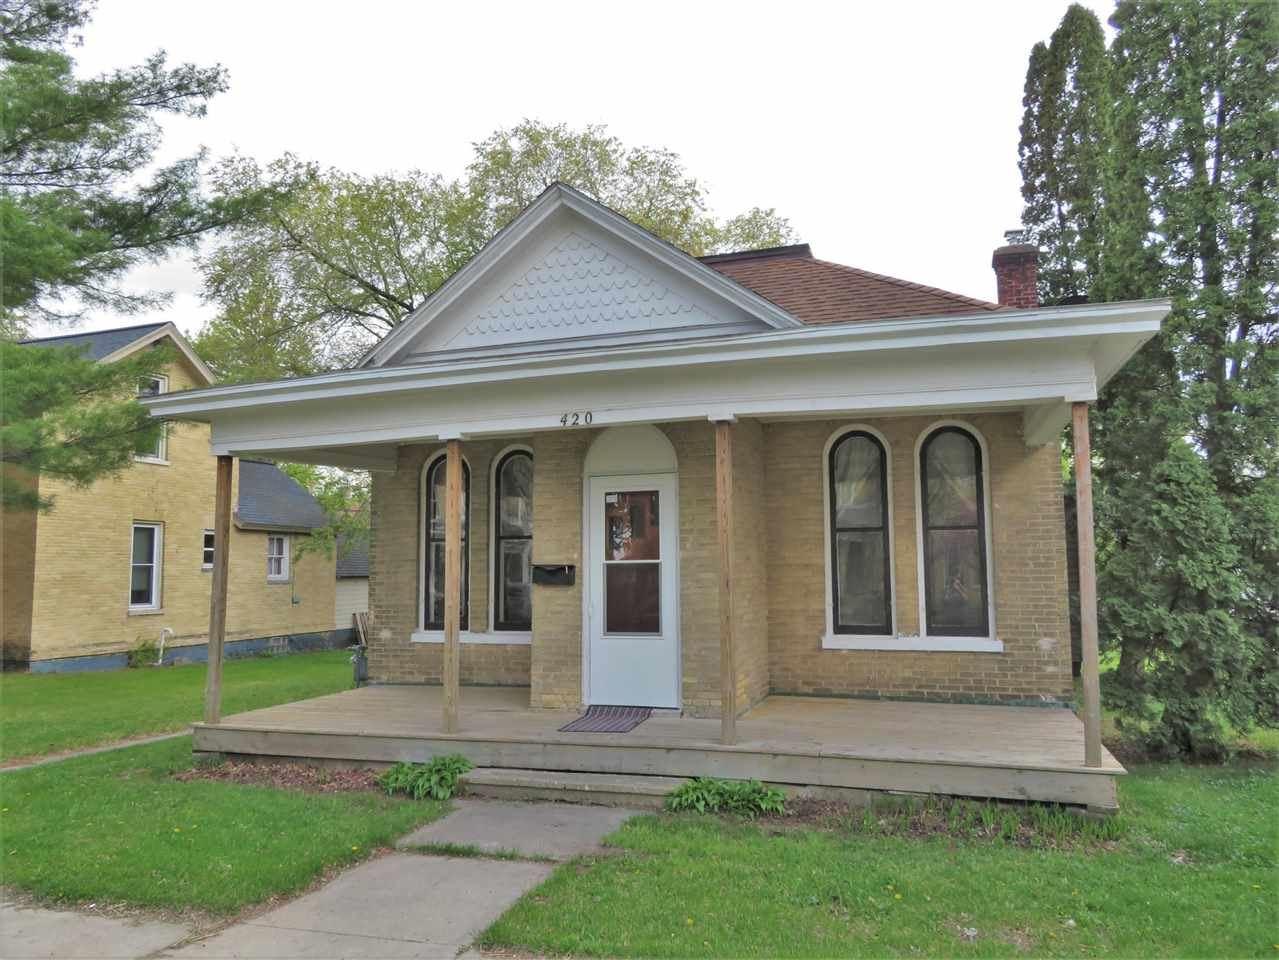 420 W Cook St, Portage, WI 53901 - #: 1909100